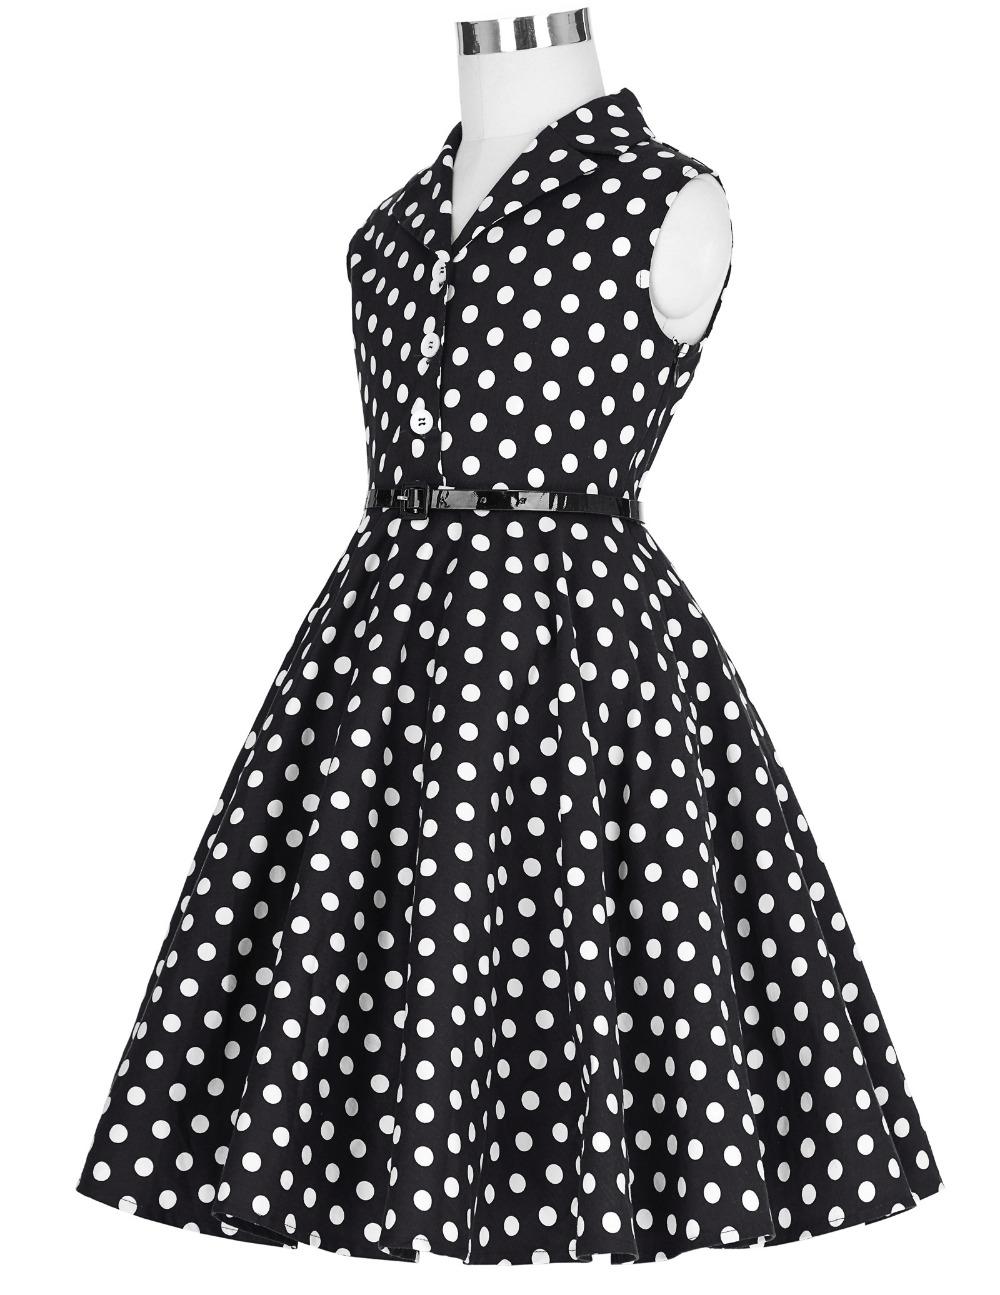 Grace Karin Flower Girl Dresses for Weddings 2017 Sleeveless Polka Dots Printed Vintage Pin Up Style Children's Clothing 7